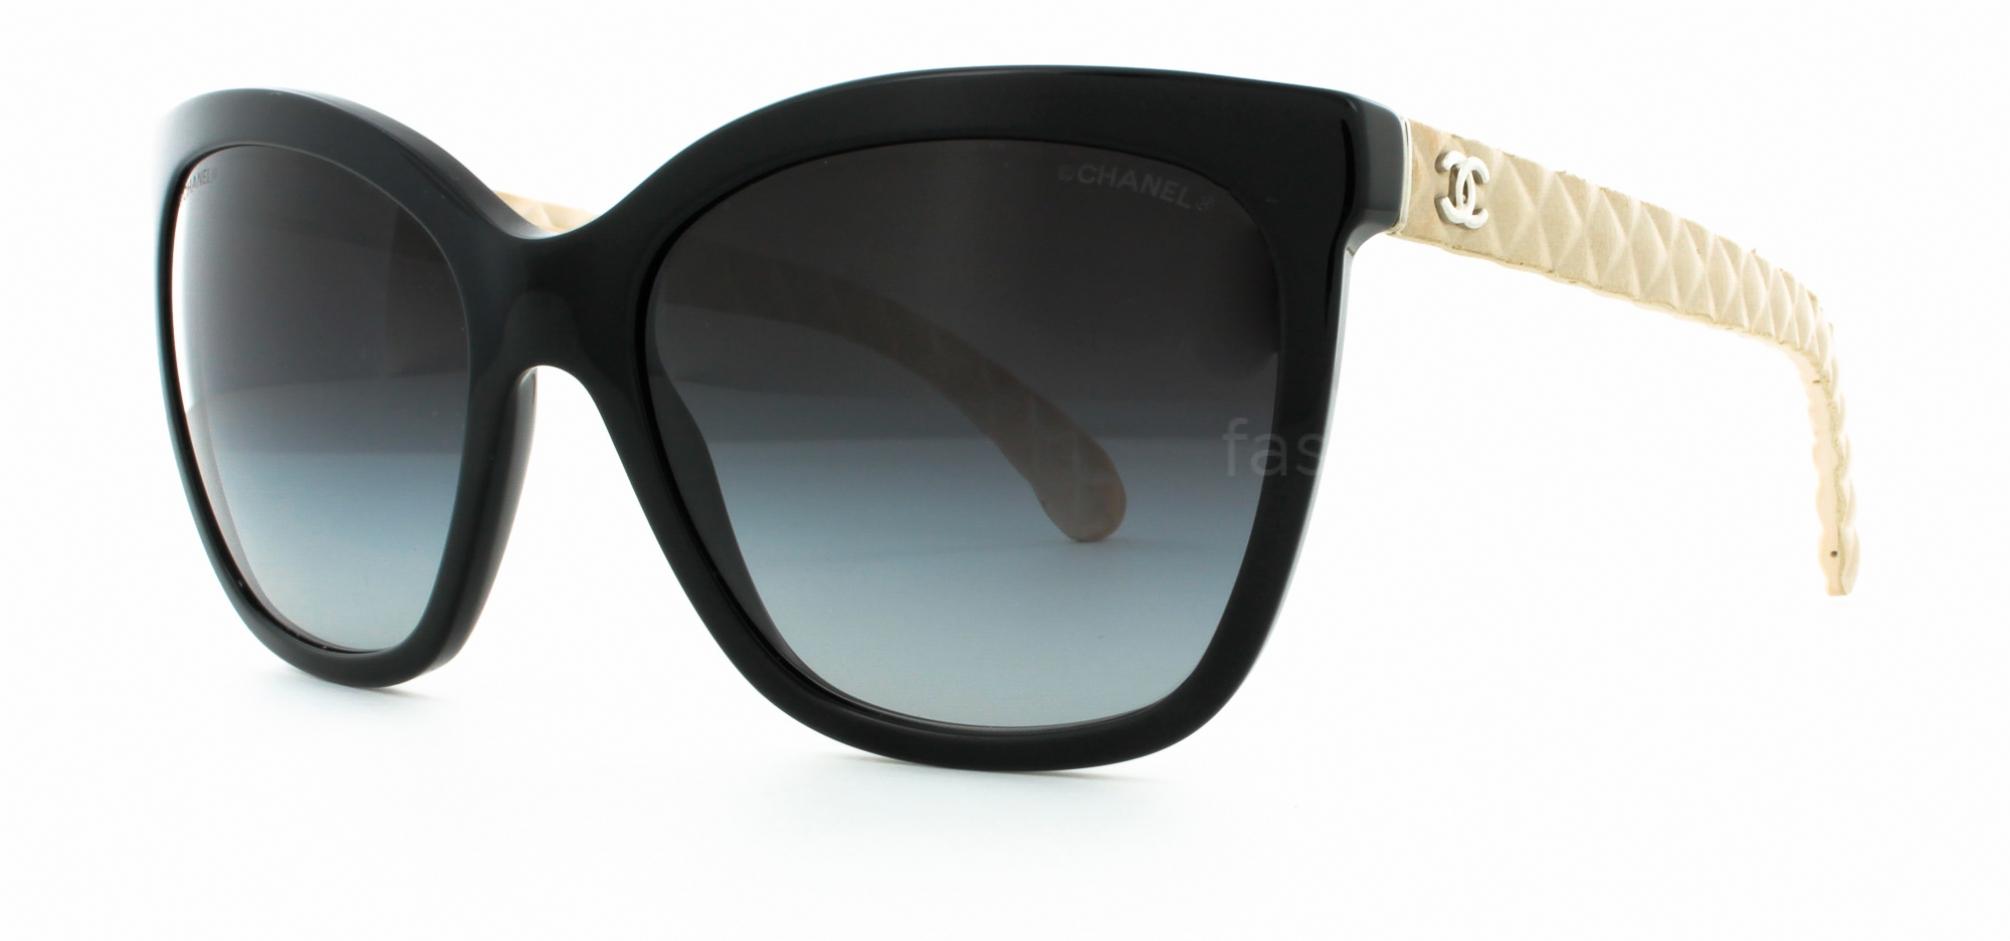 0e34f2ee30a Chanel Butterfly Eyeglasses 3360